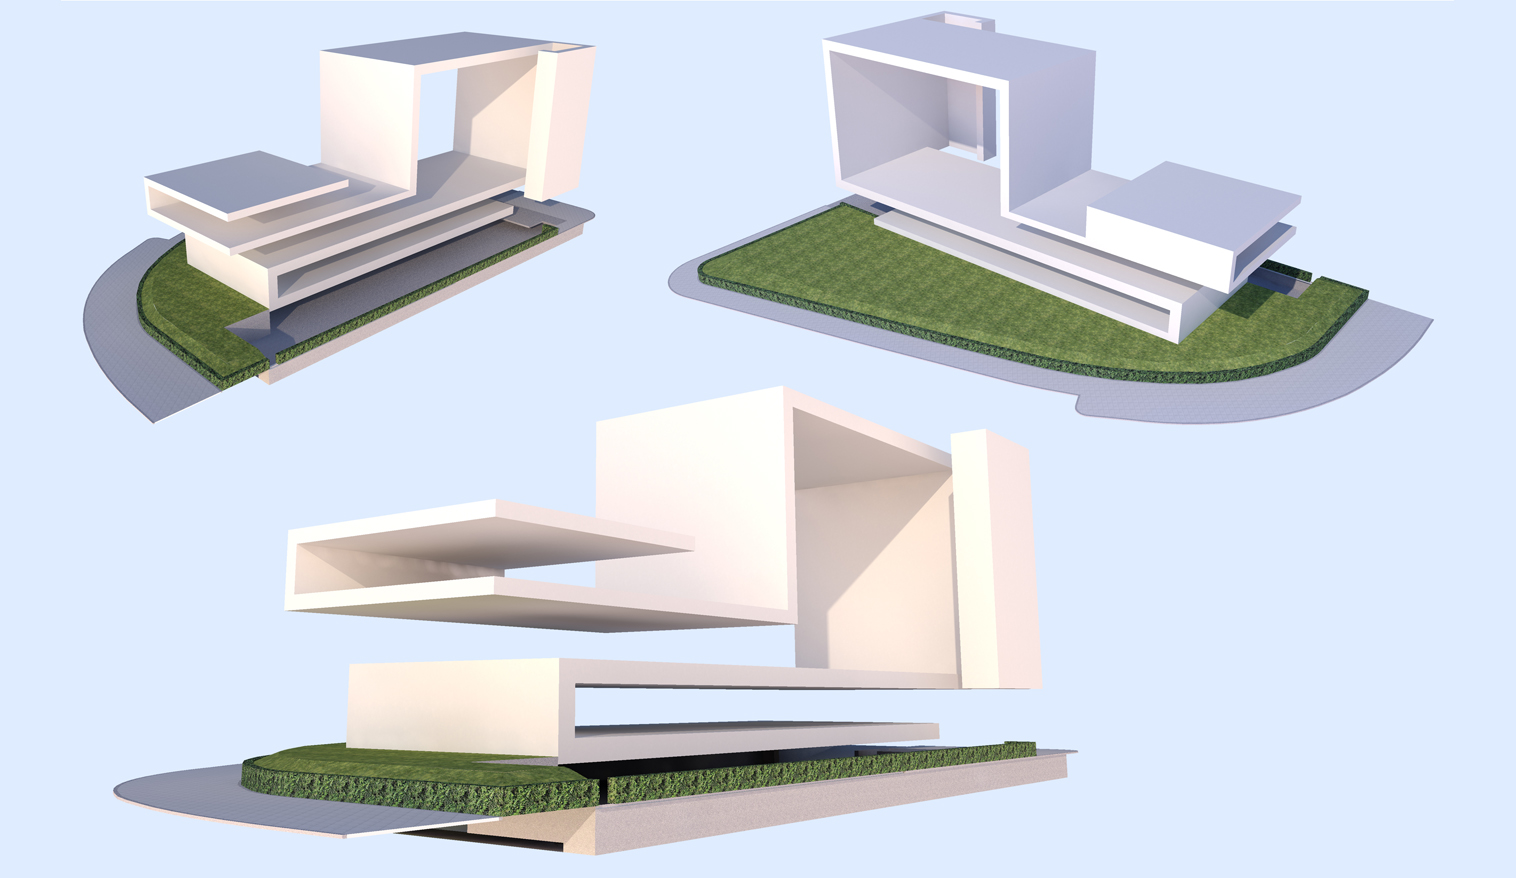 03 OPL Architecten_Ravellaan Utrecht-1516×878-72dpi